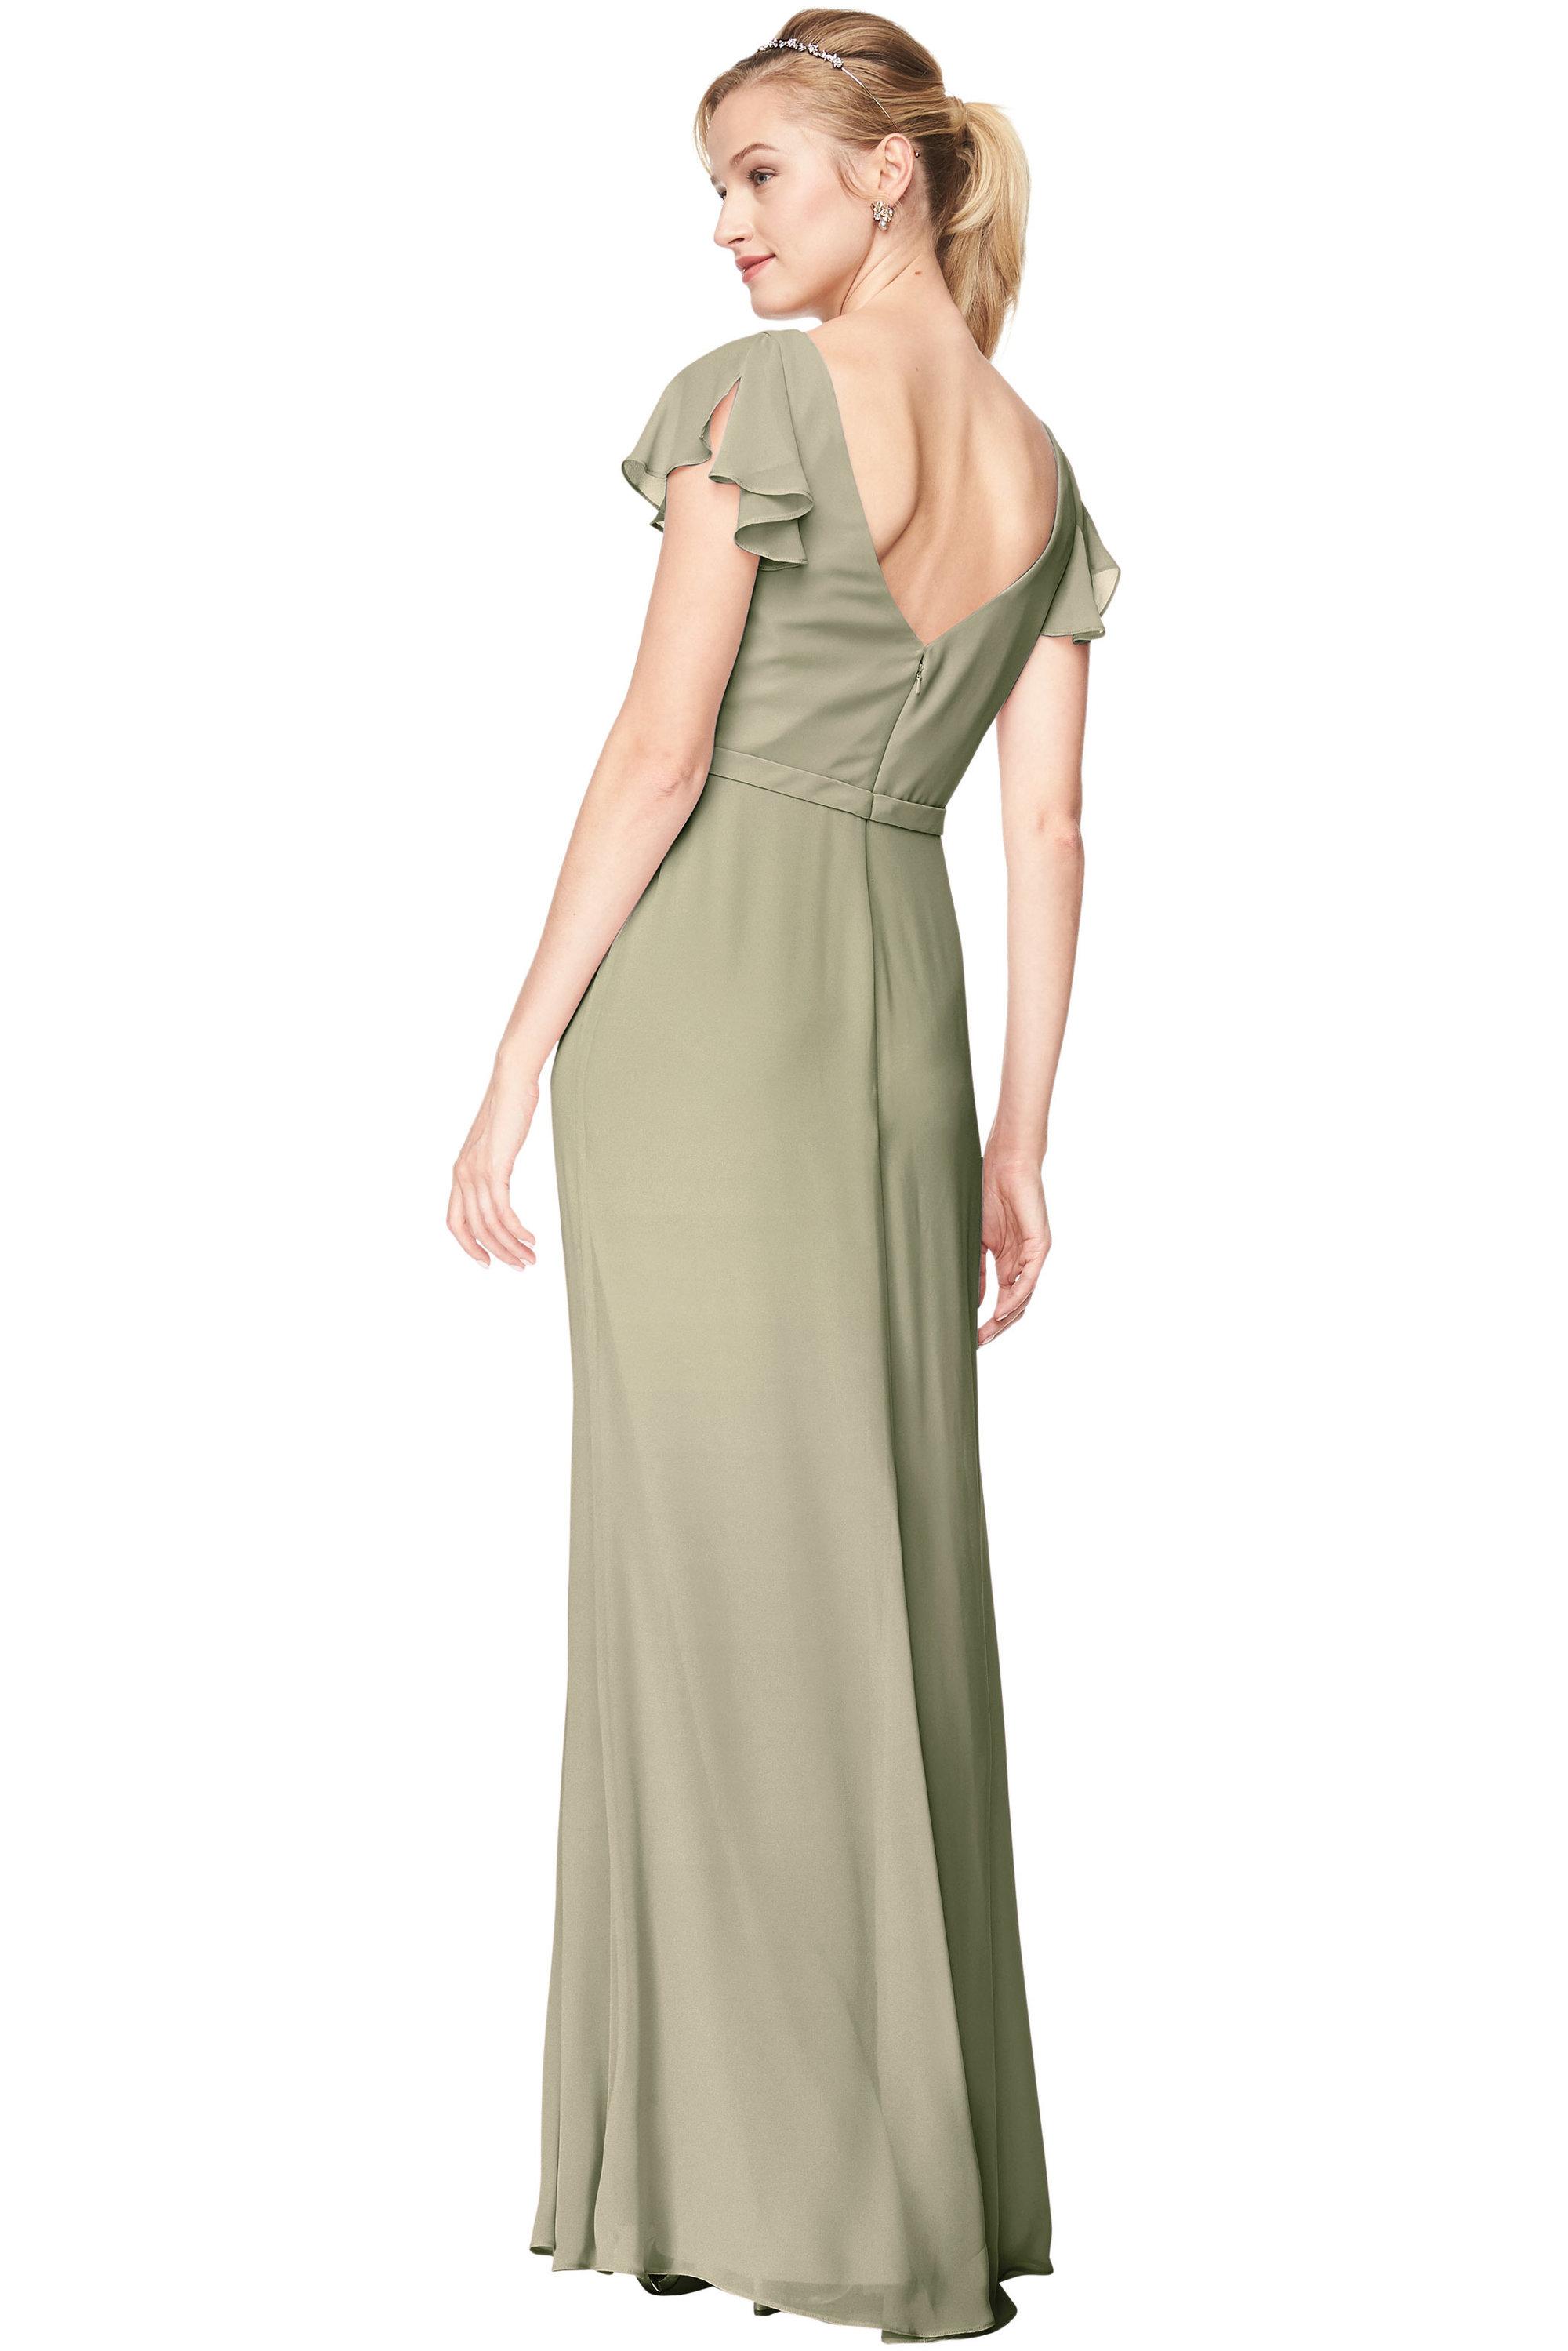 Bill Levkoff PISTACHIO Chiffon V-Neck A-Line gown, $184.00 Back